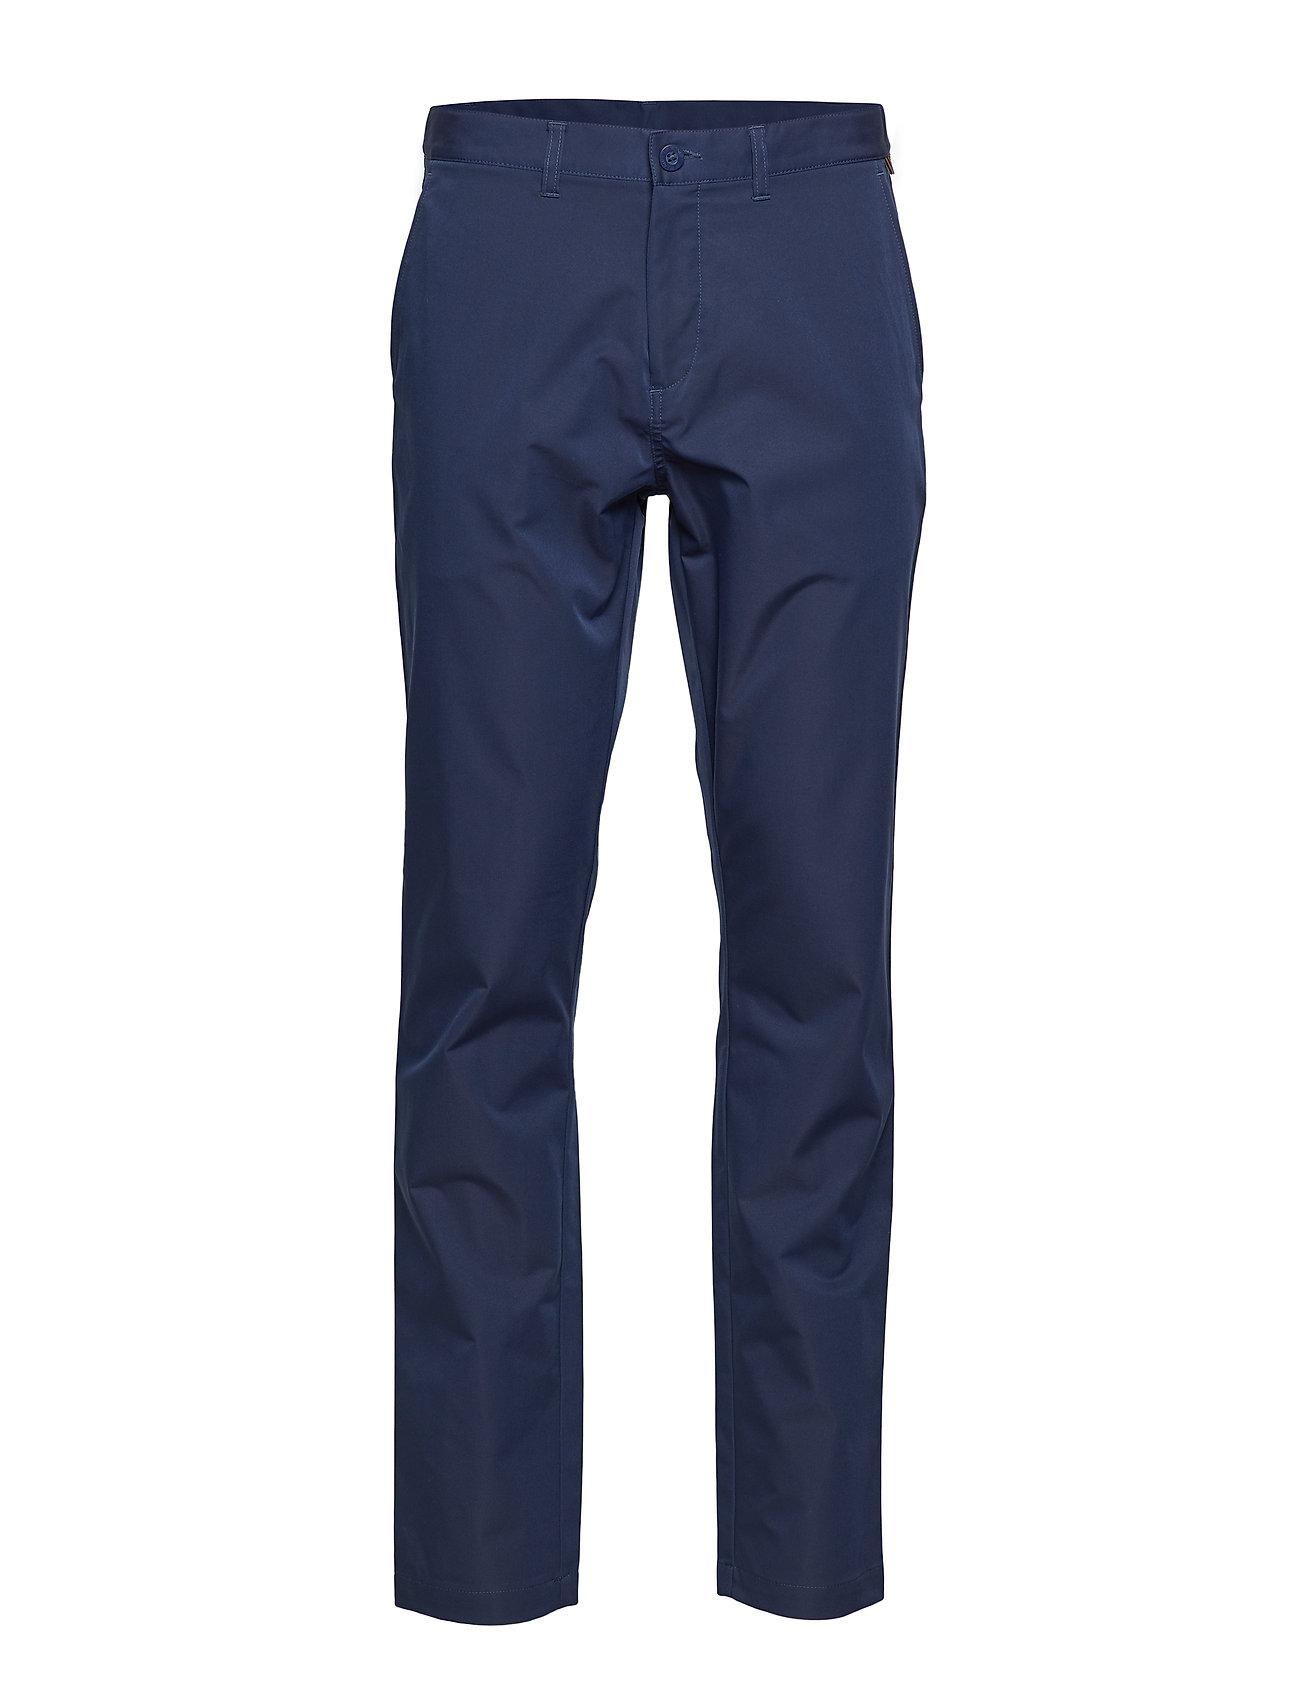 Lyle & Scott Sport Forres Tech Trousers - NAVY